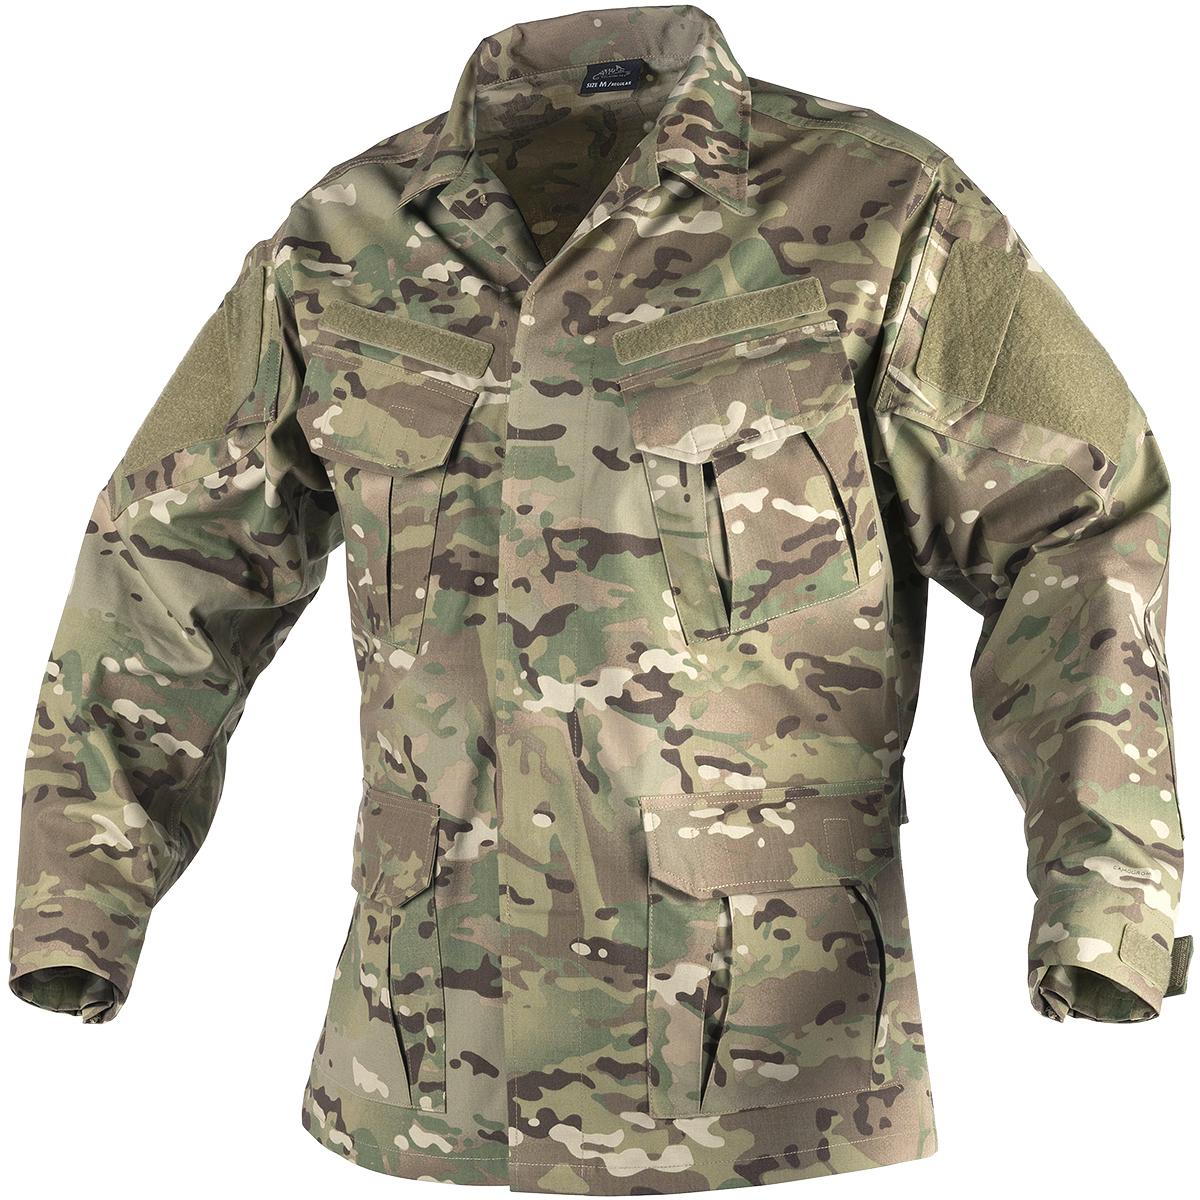 helikon sfu next military combat uniform shirt mens